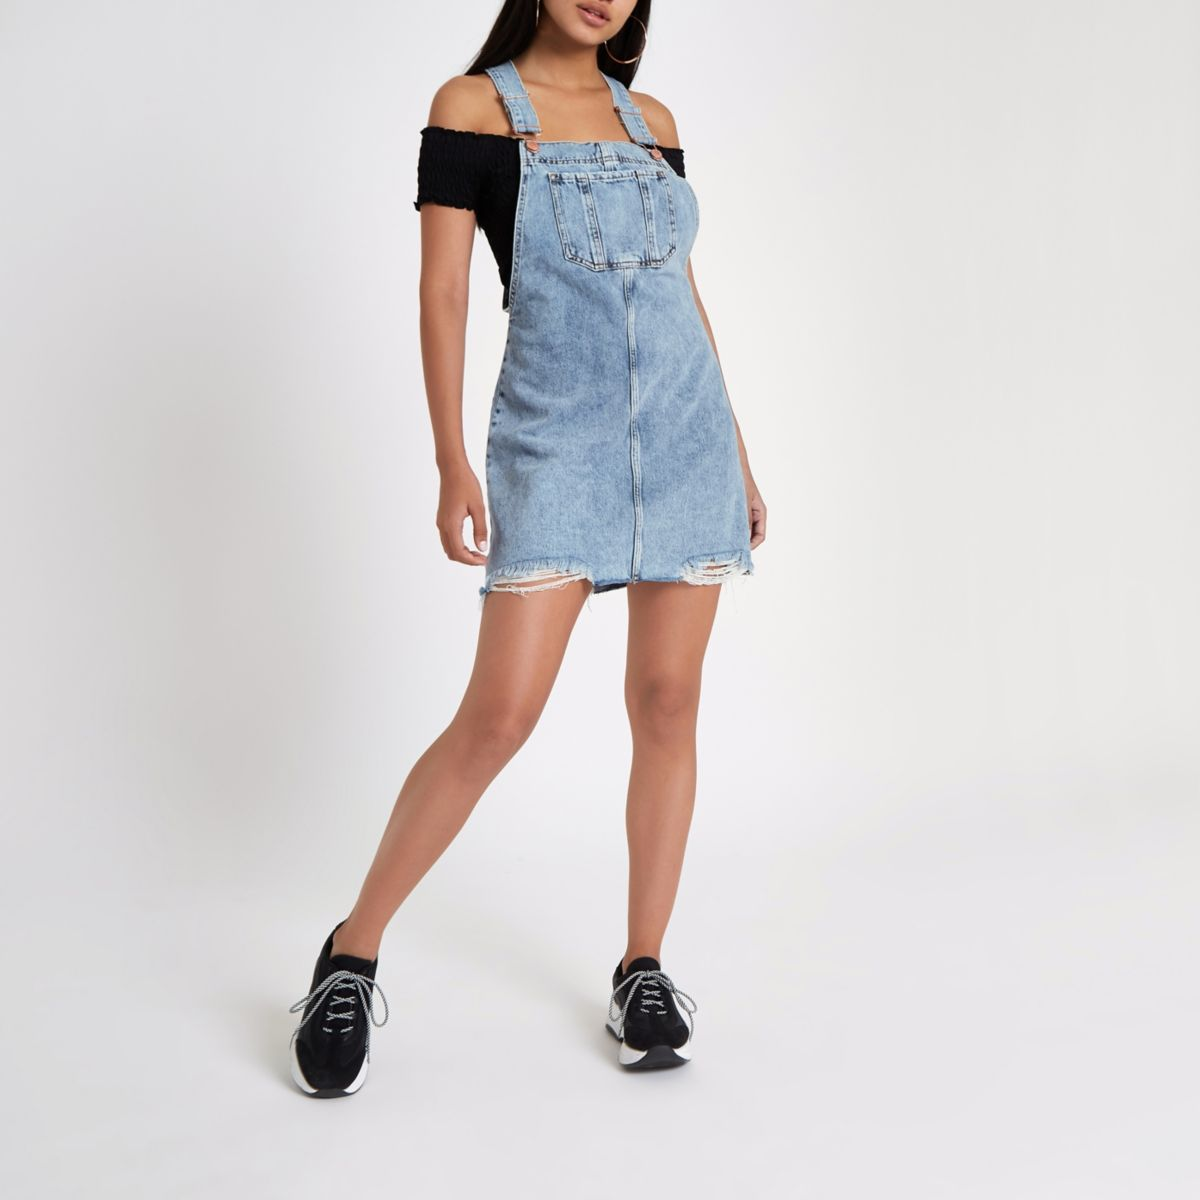 Light blue ripped denim overall dress